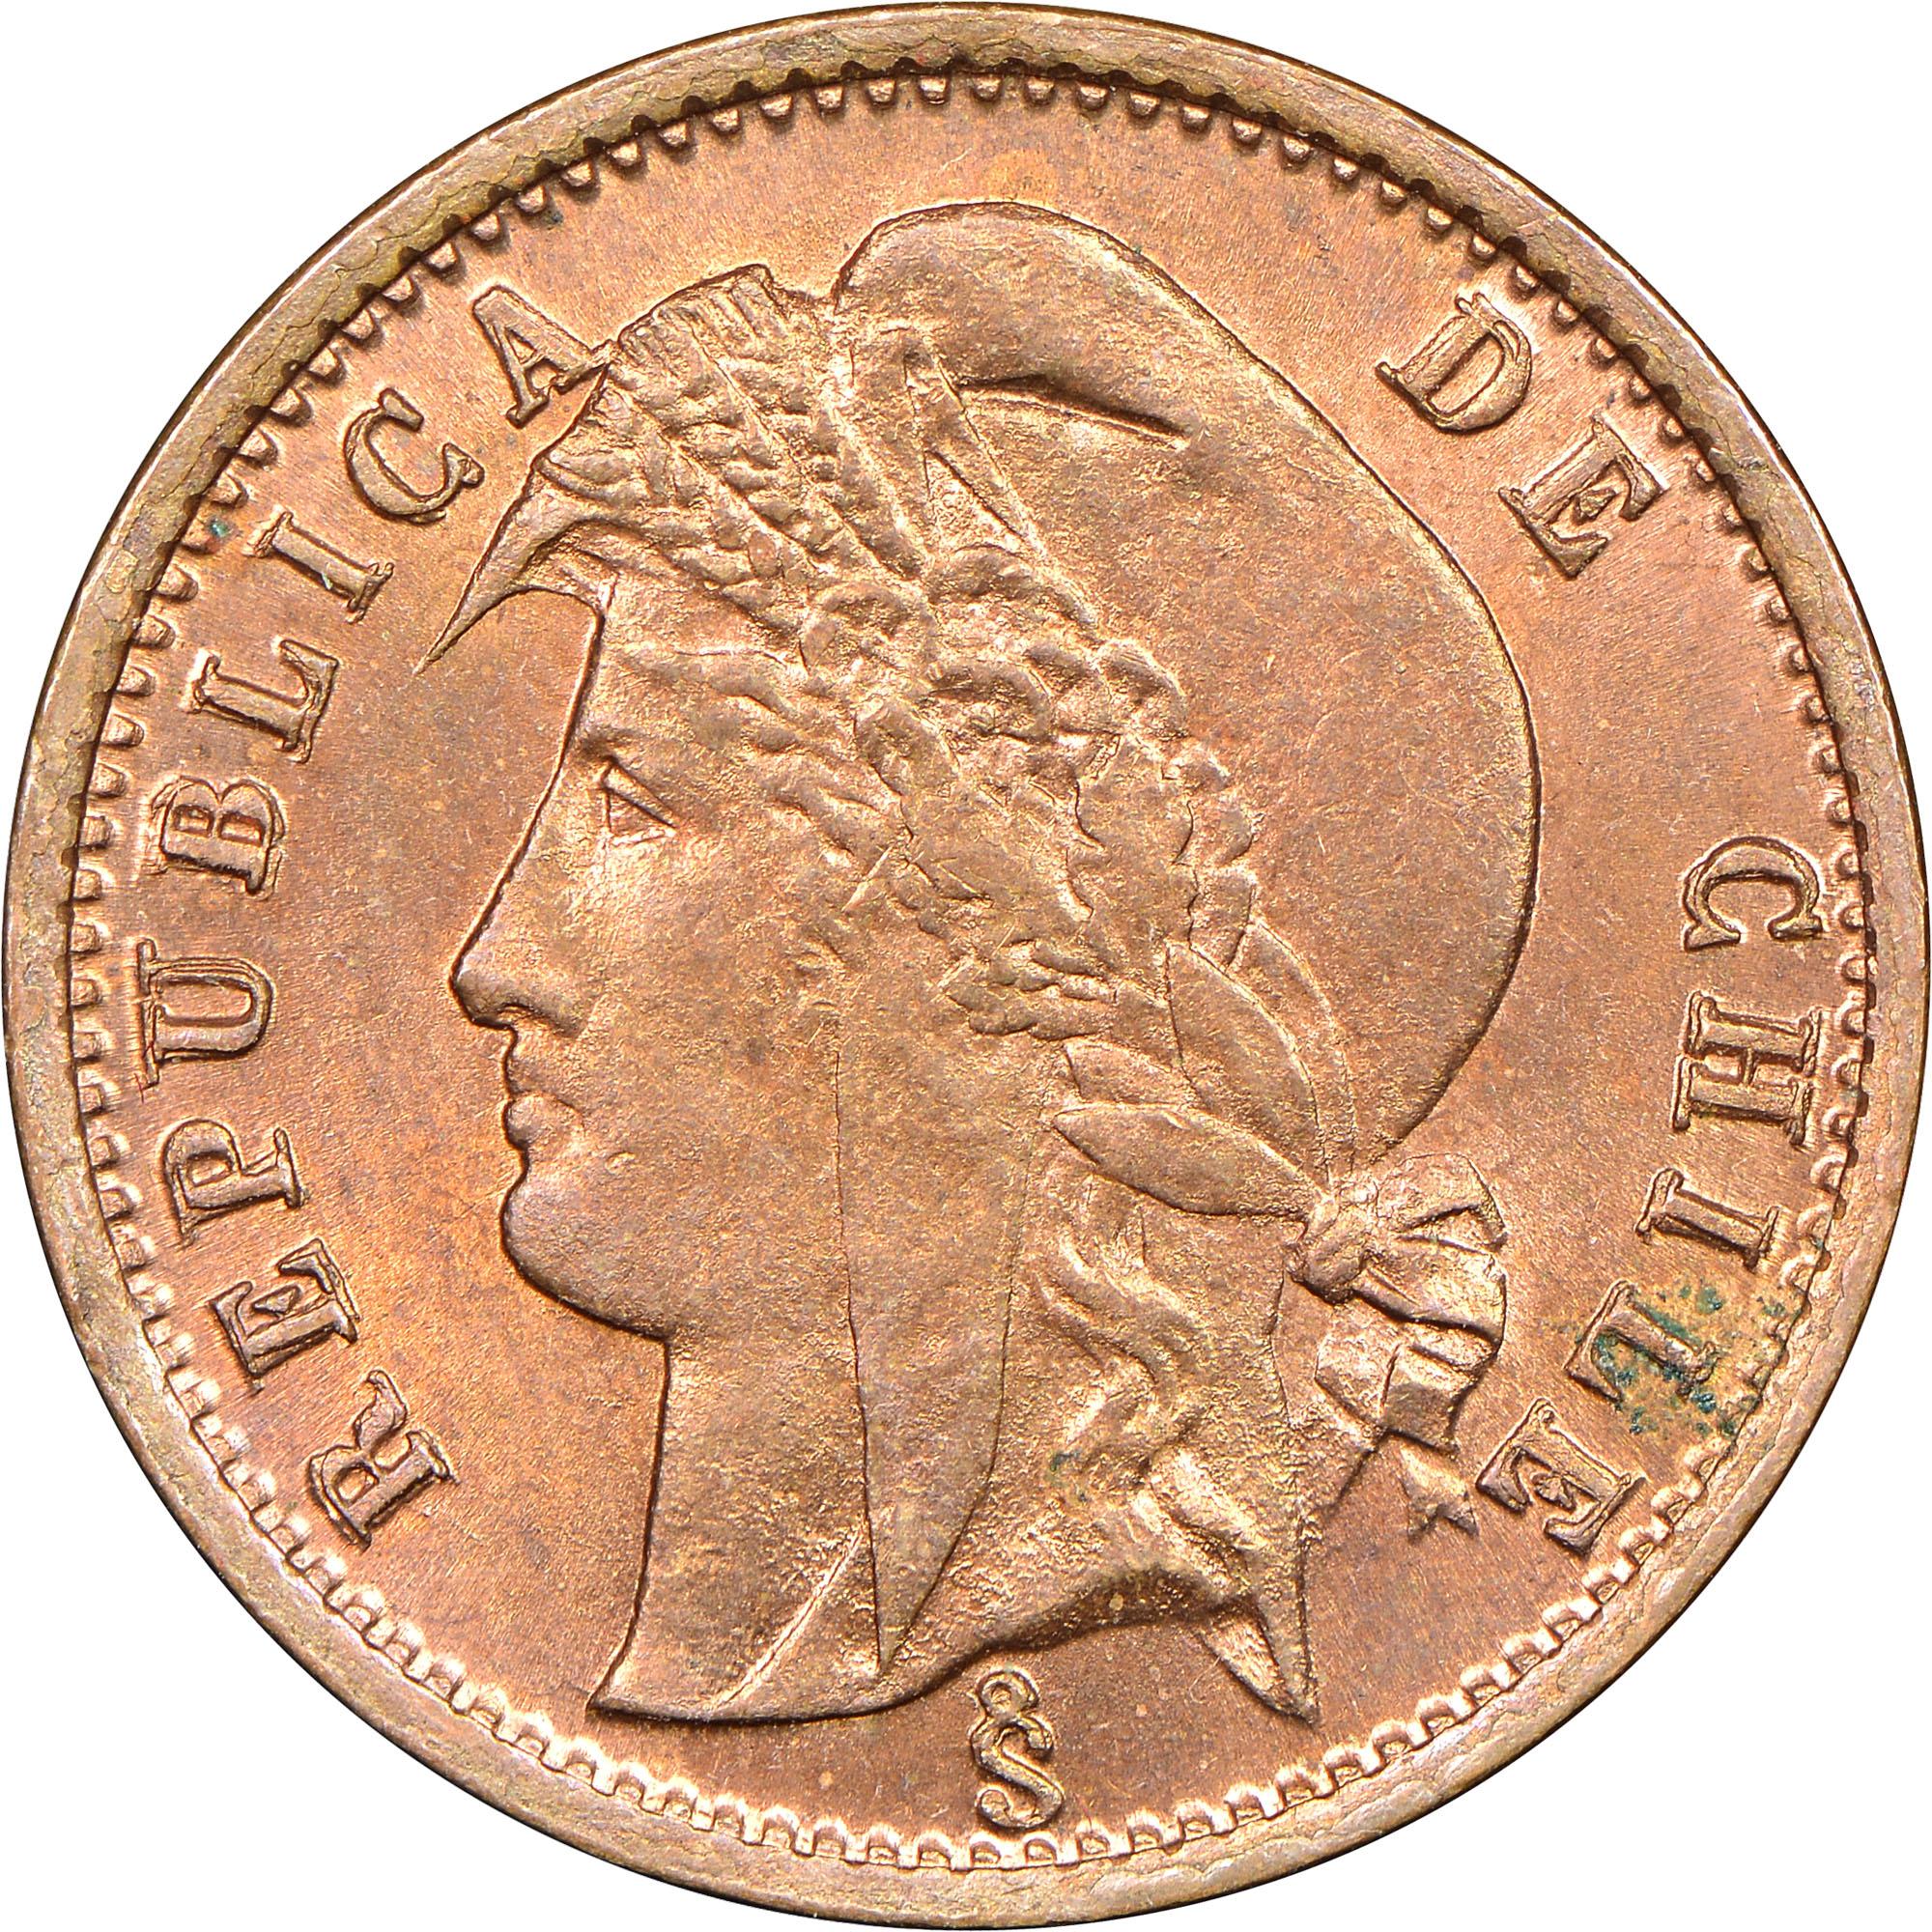 1883-1894 Chile 1/2 Centavo obverse